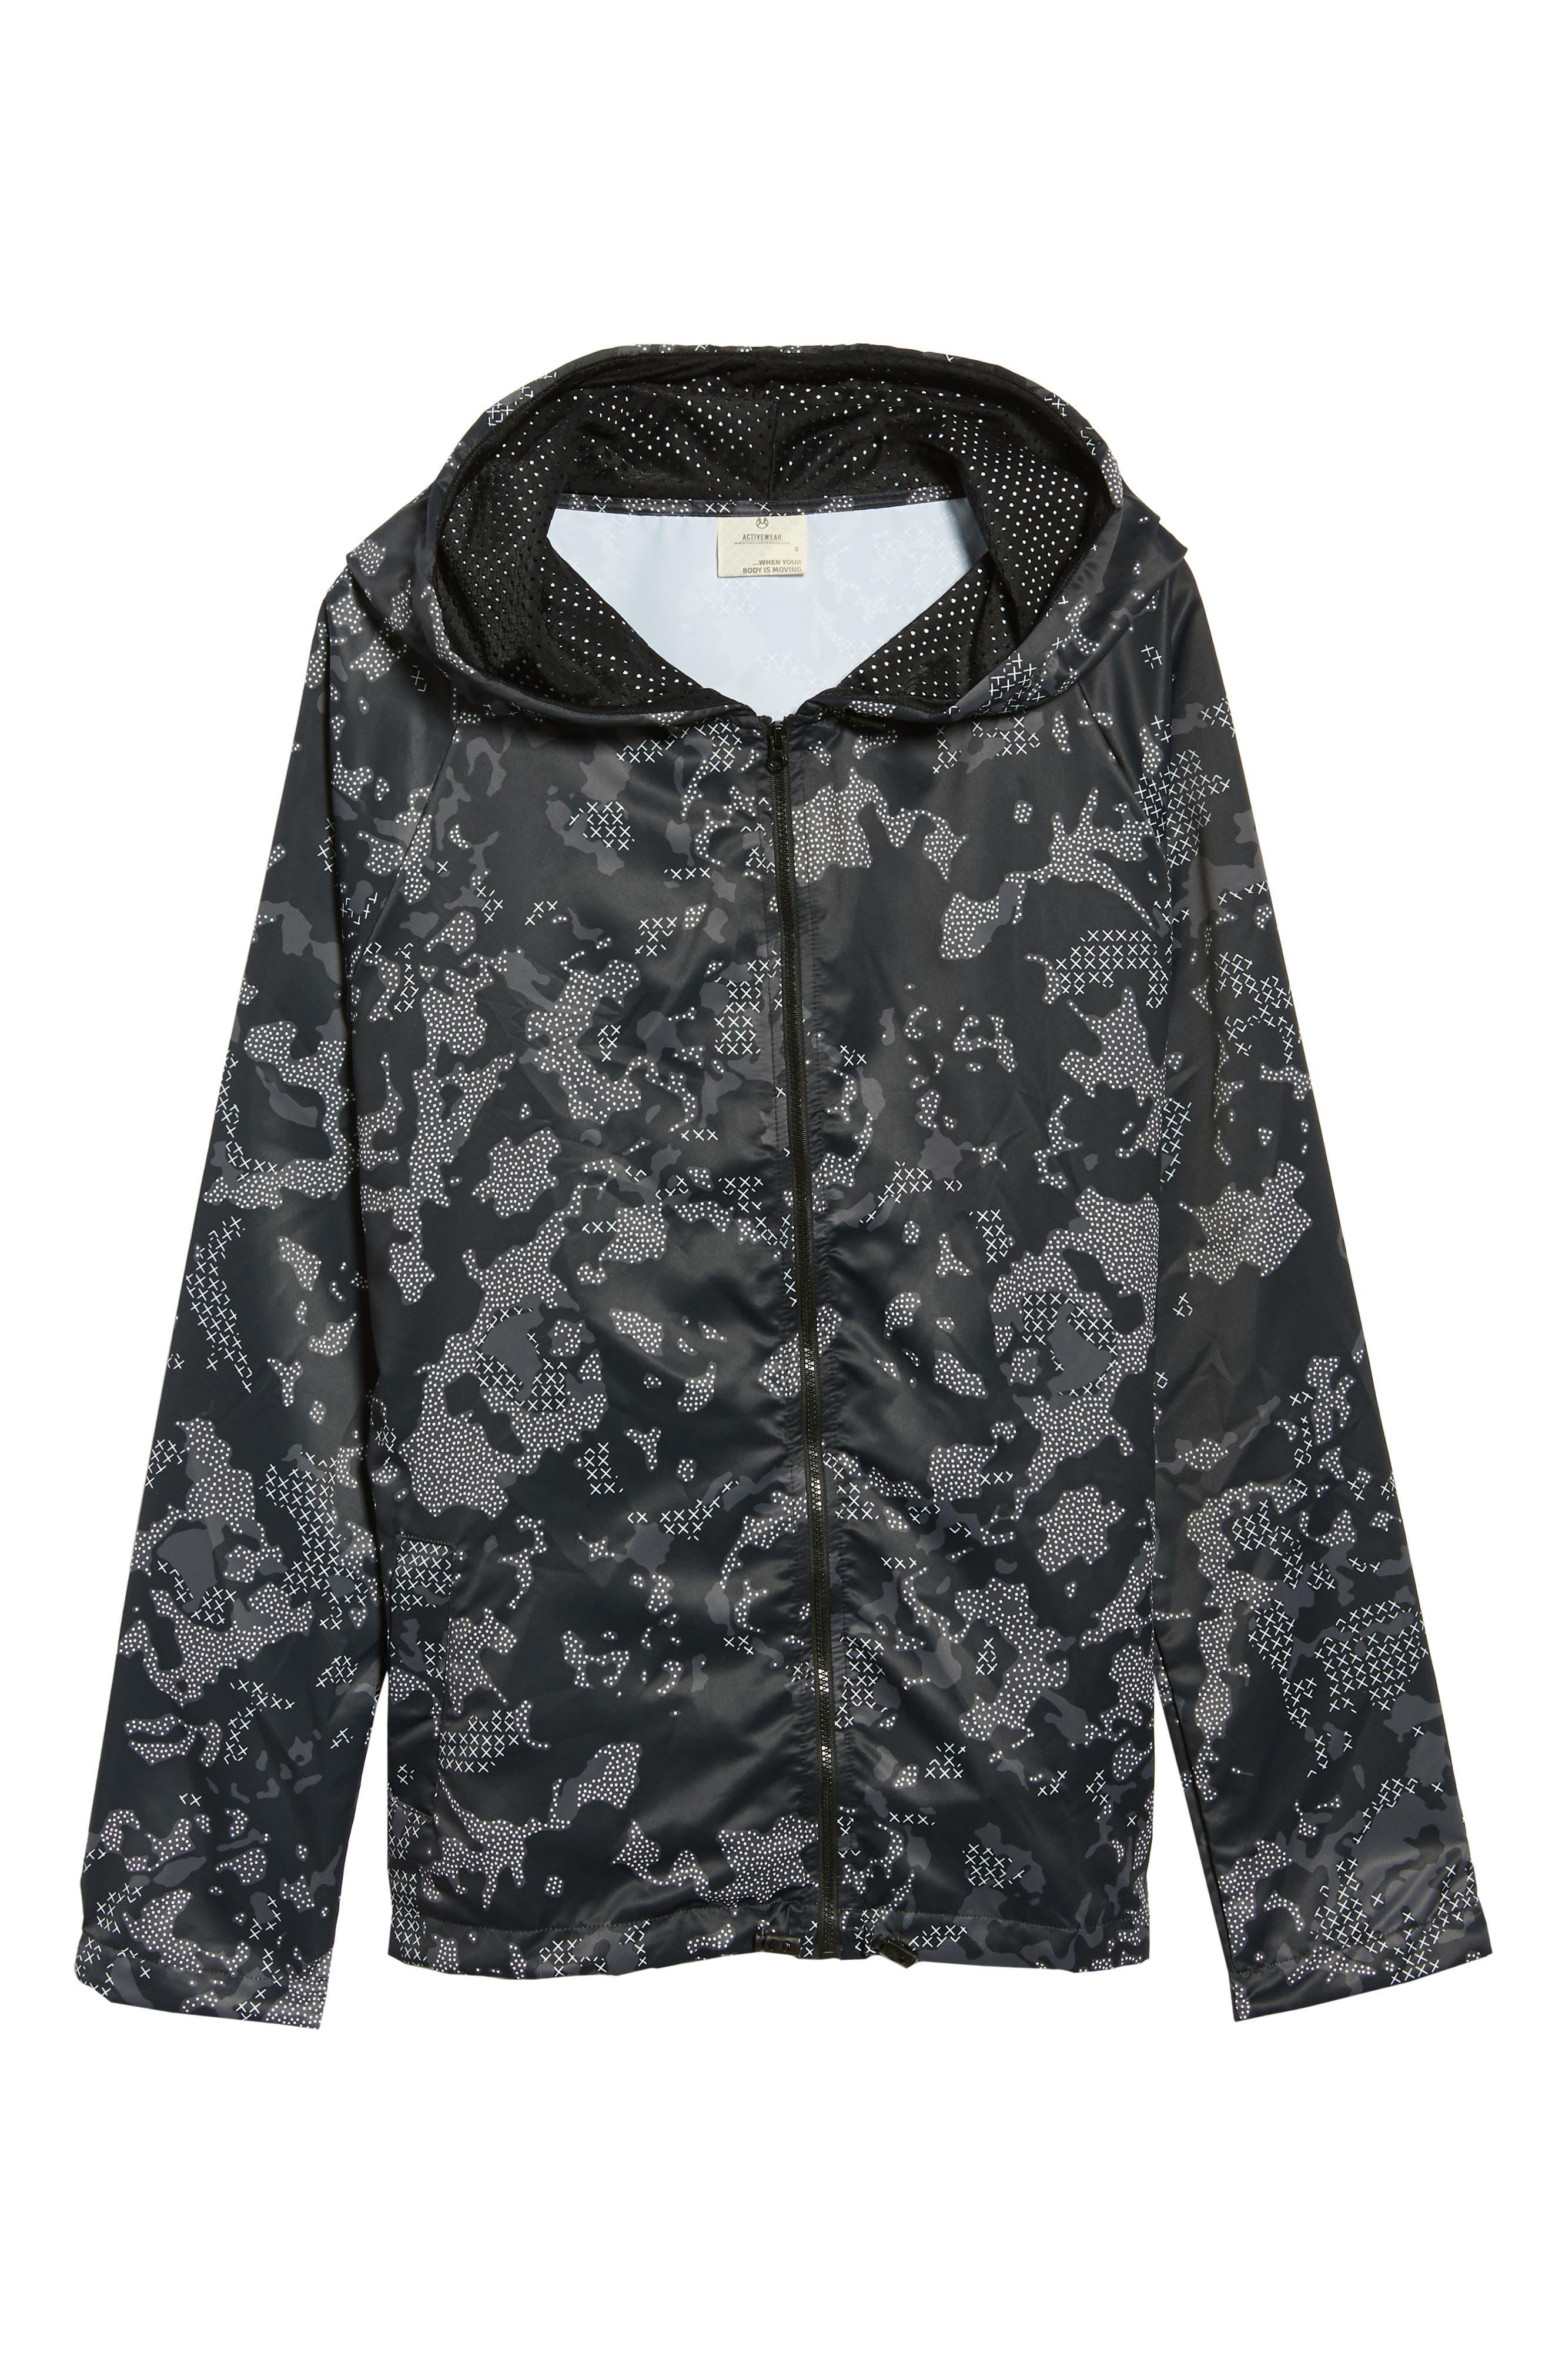 Brisk Black Camo Jacket,                             Alternate thumbnail 2, color,                             001